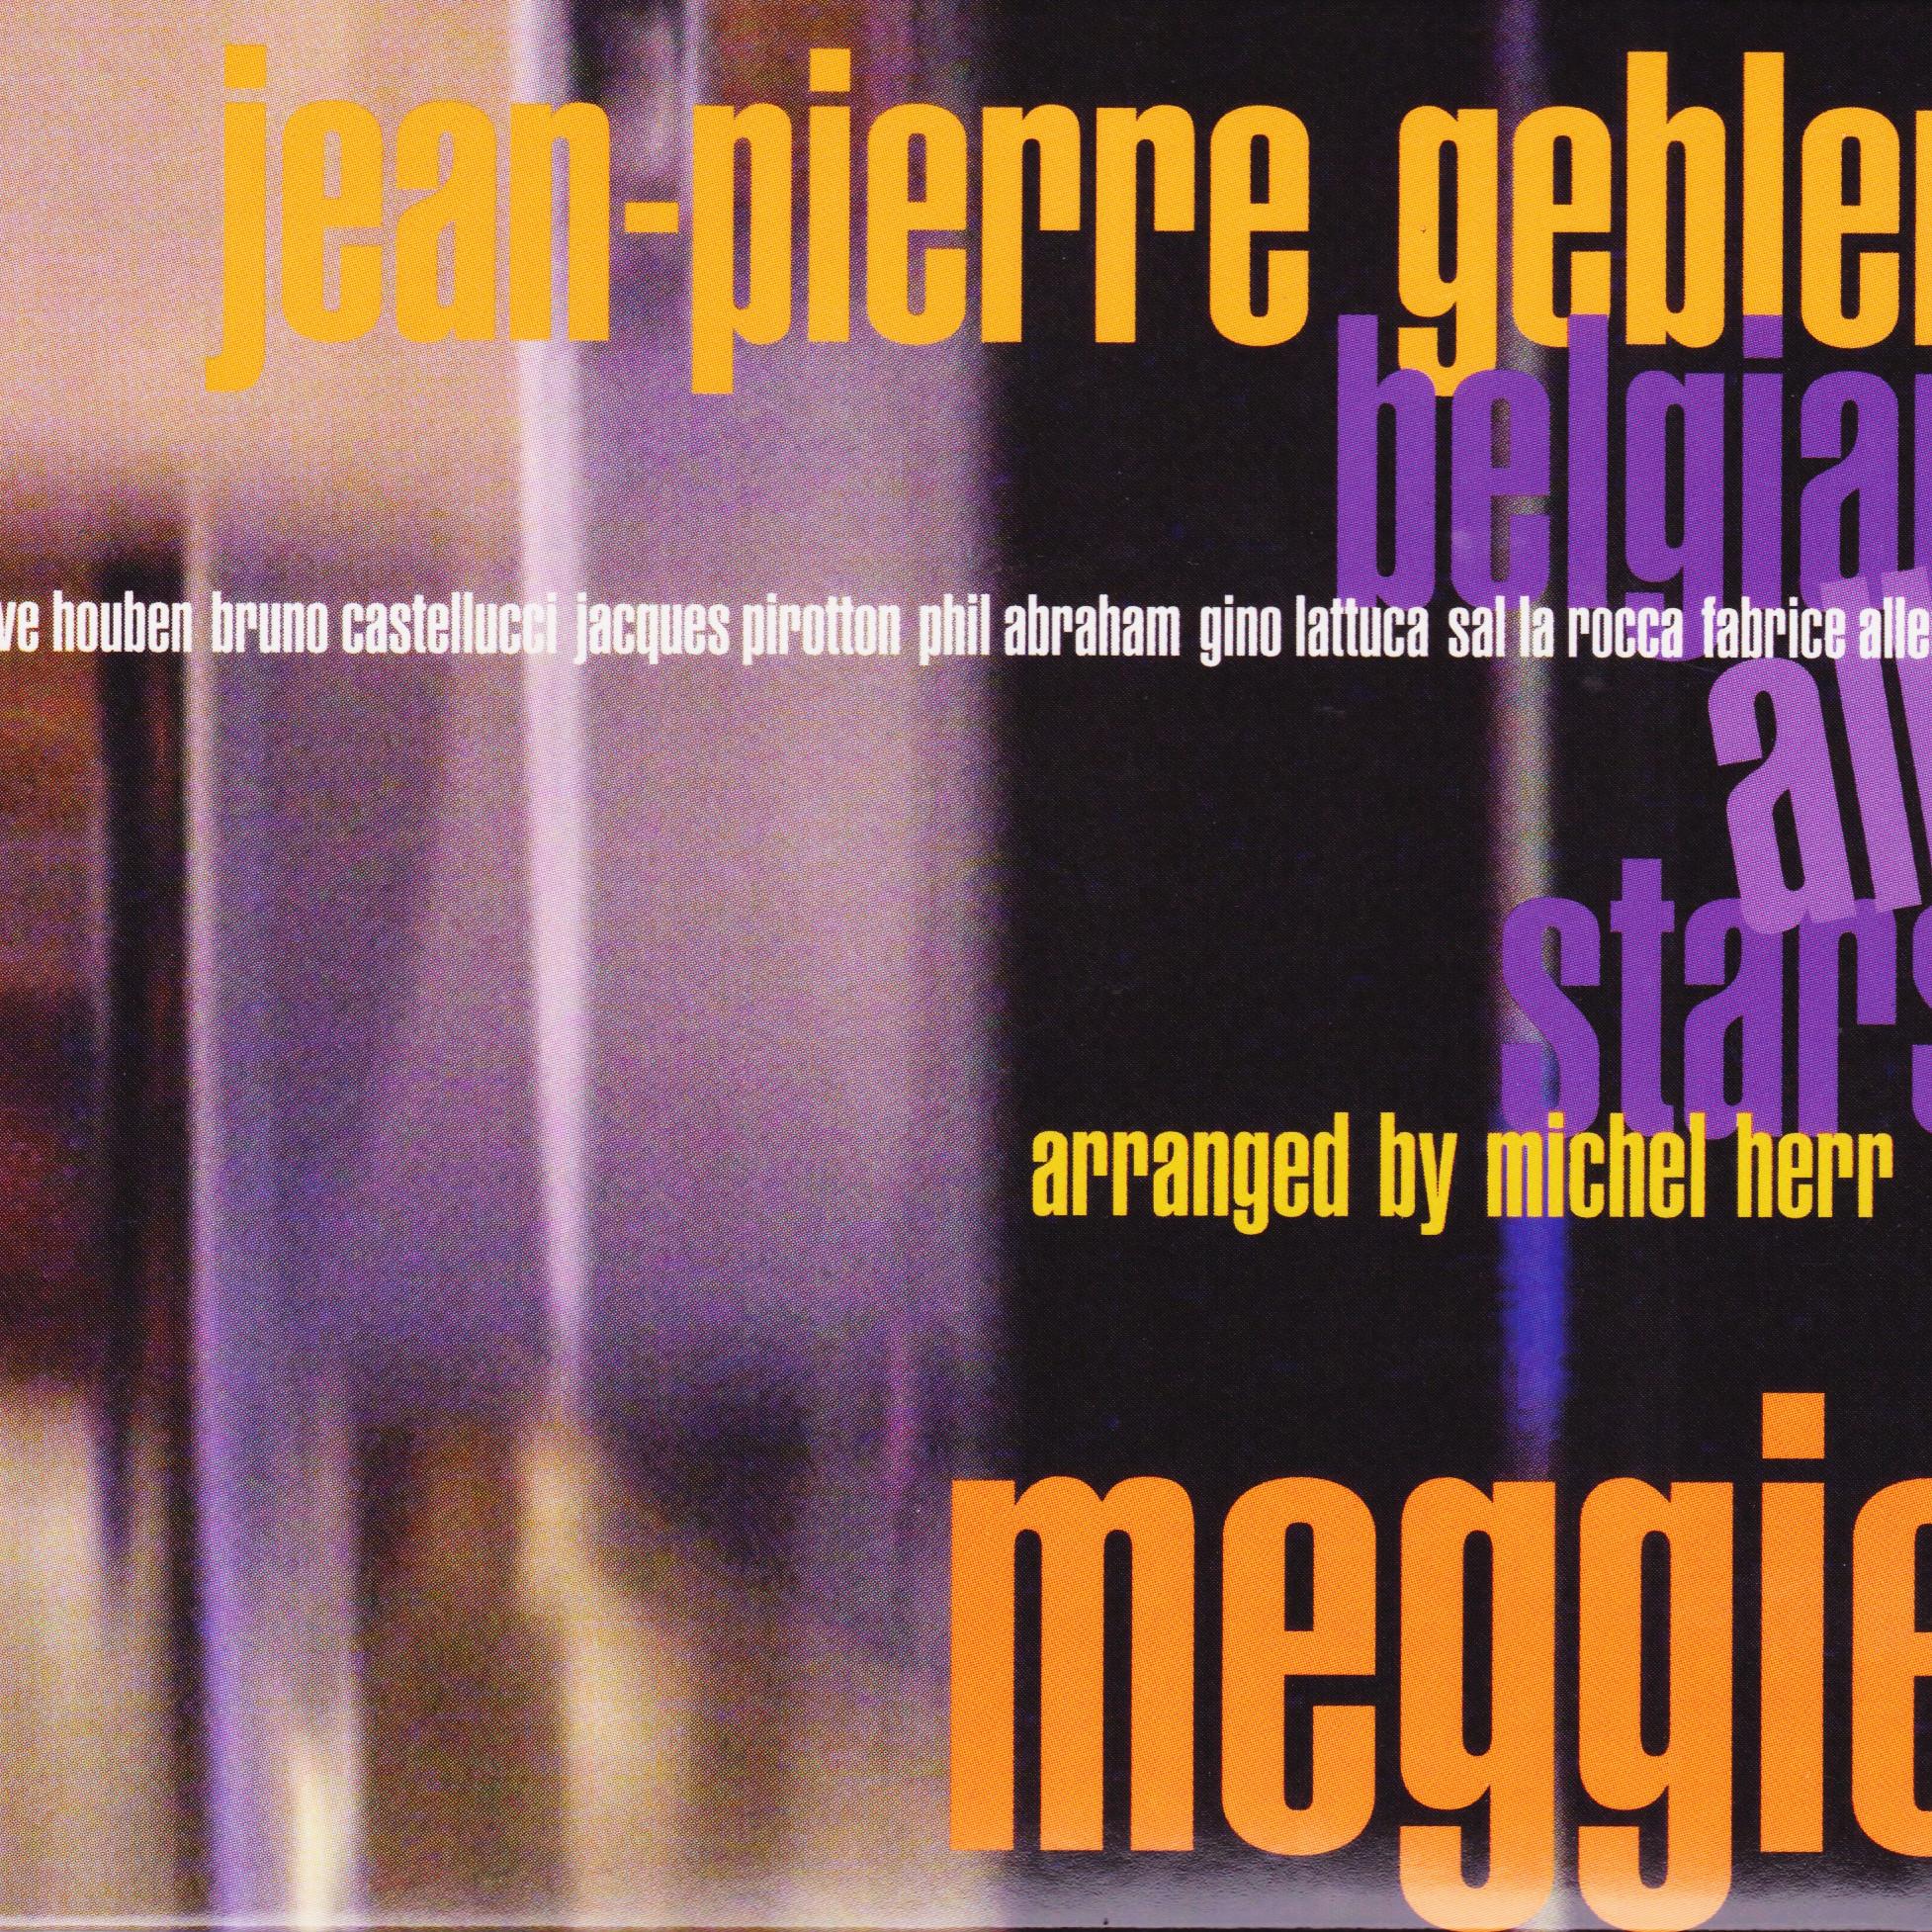 Jean-Pierre Gebler - meggie-belgian-jazz-all-stars - GAM Music